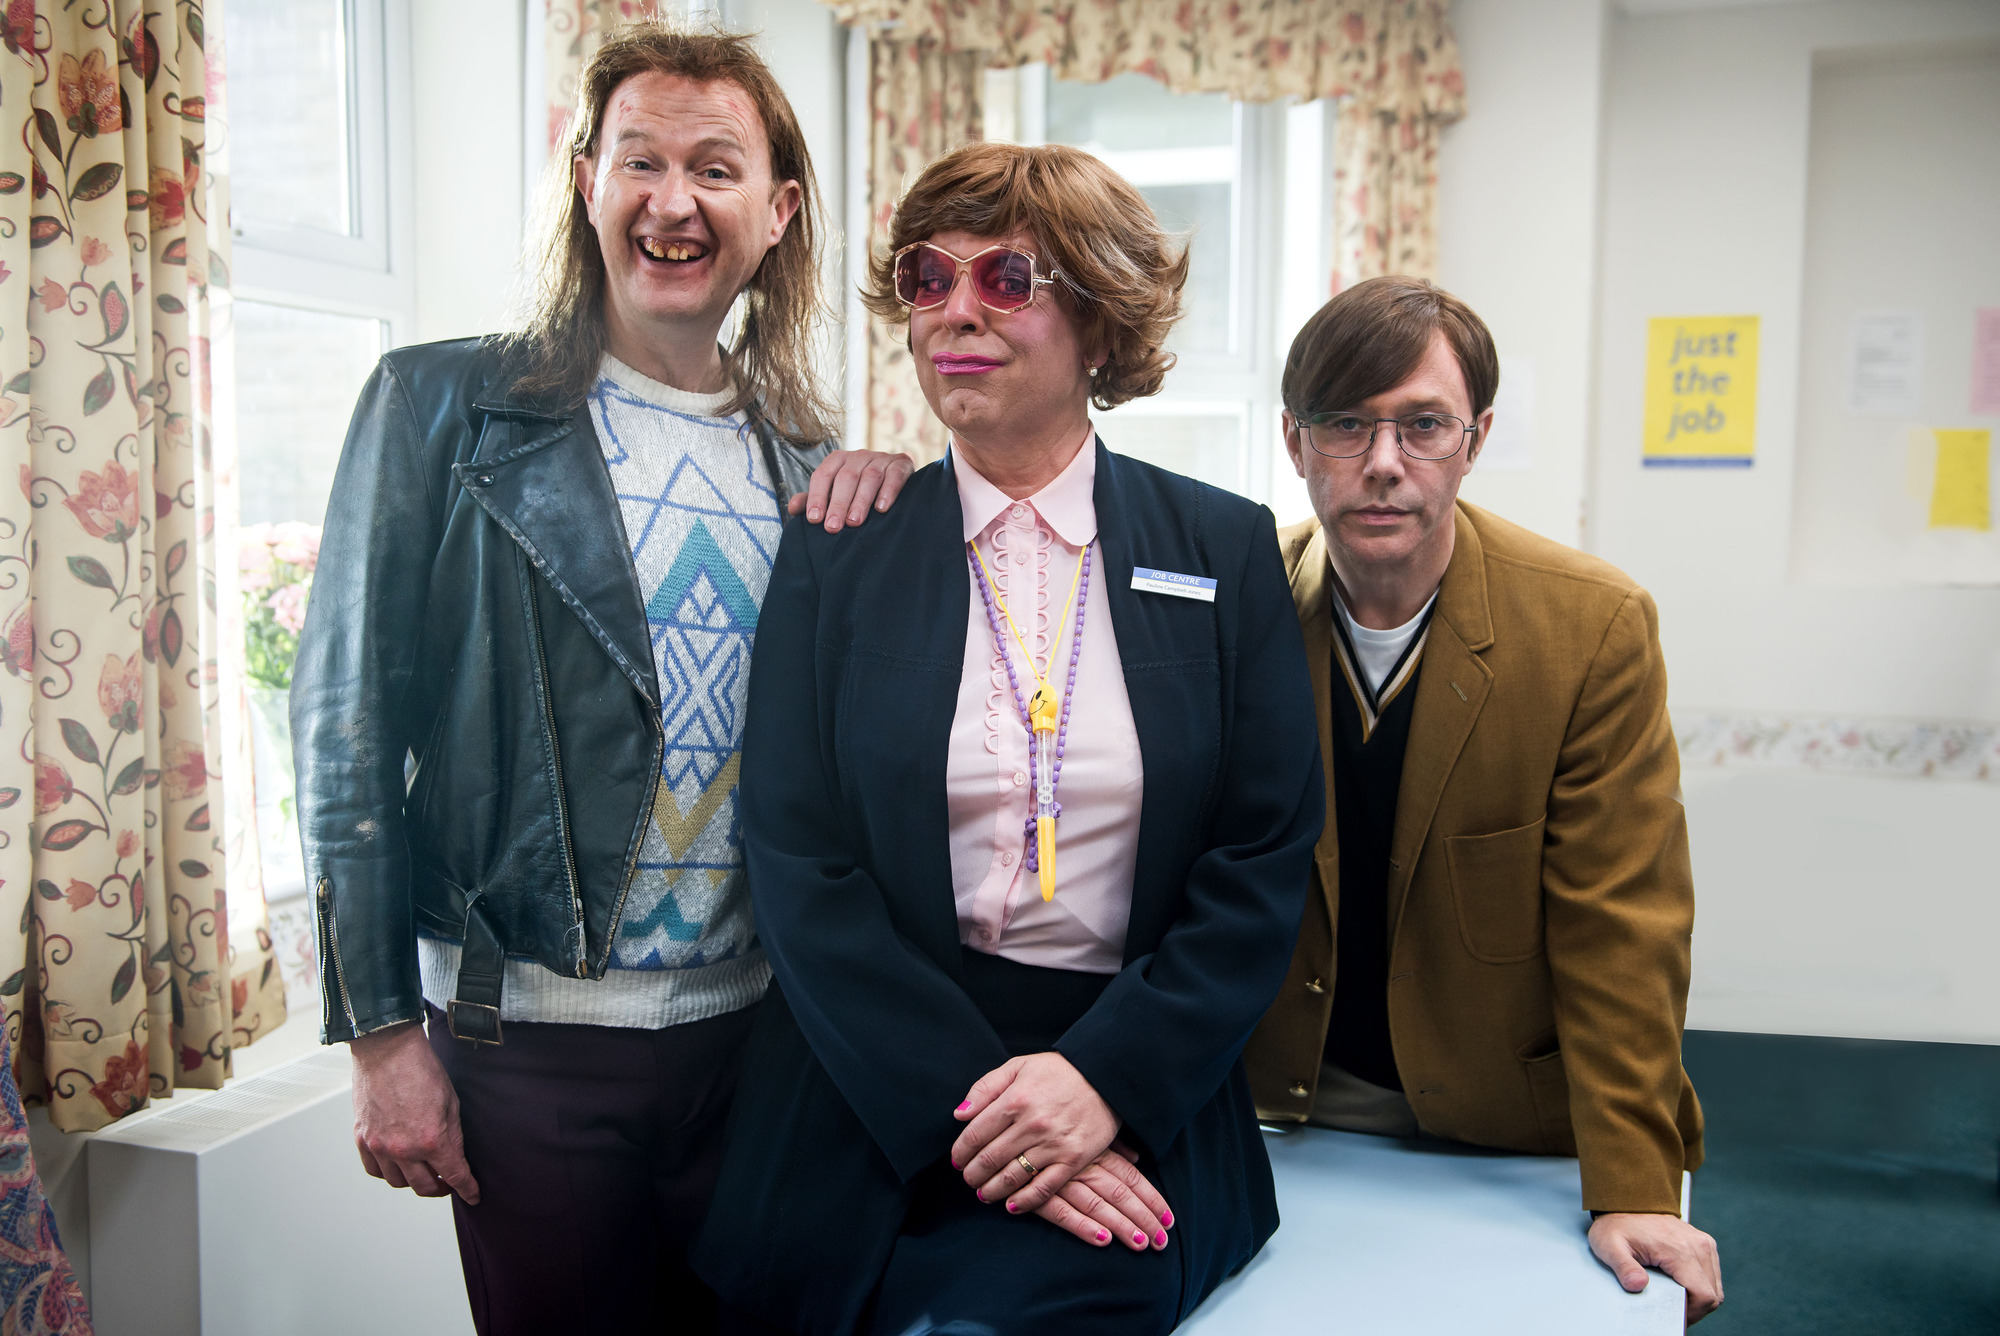 The League Of Gentlemen: Steve Pemberton teases Pauline's fate following cliffhanger